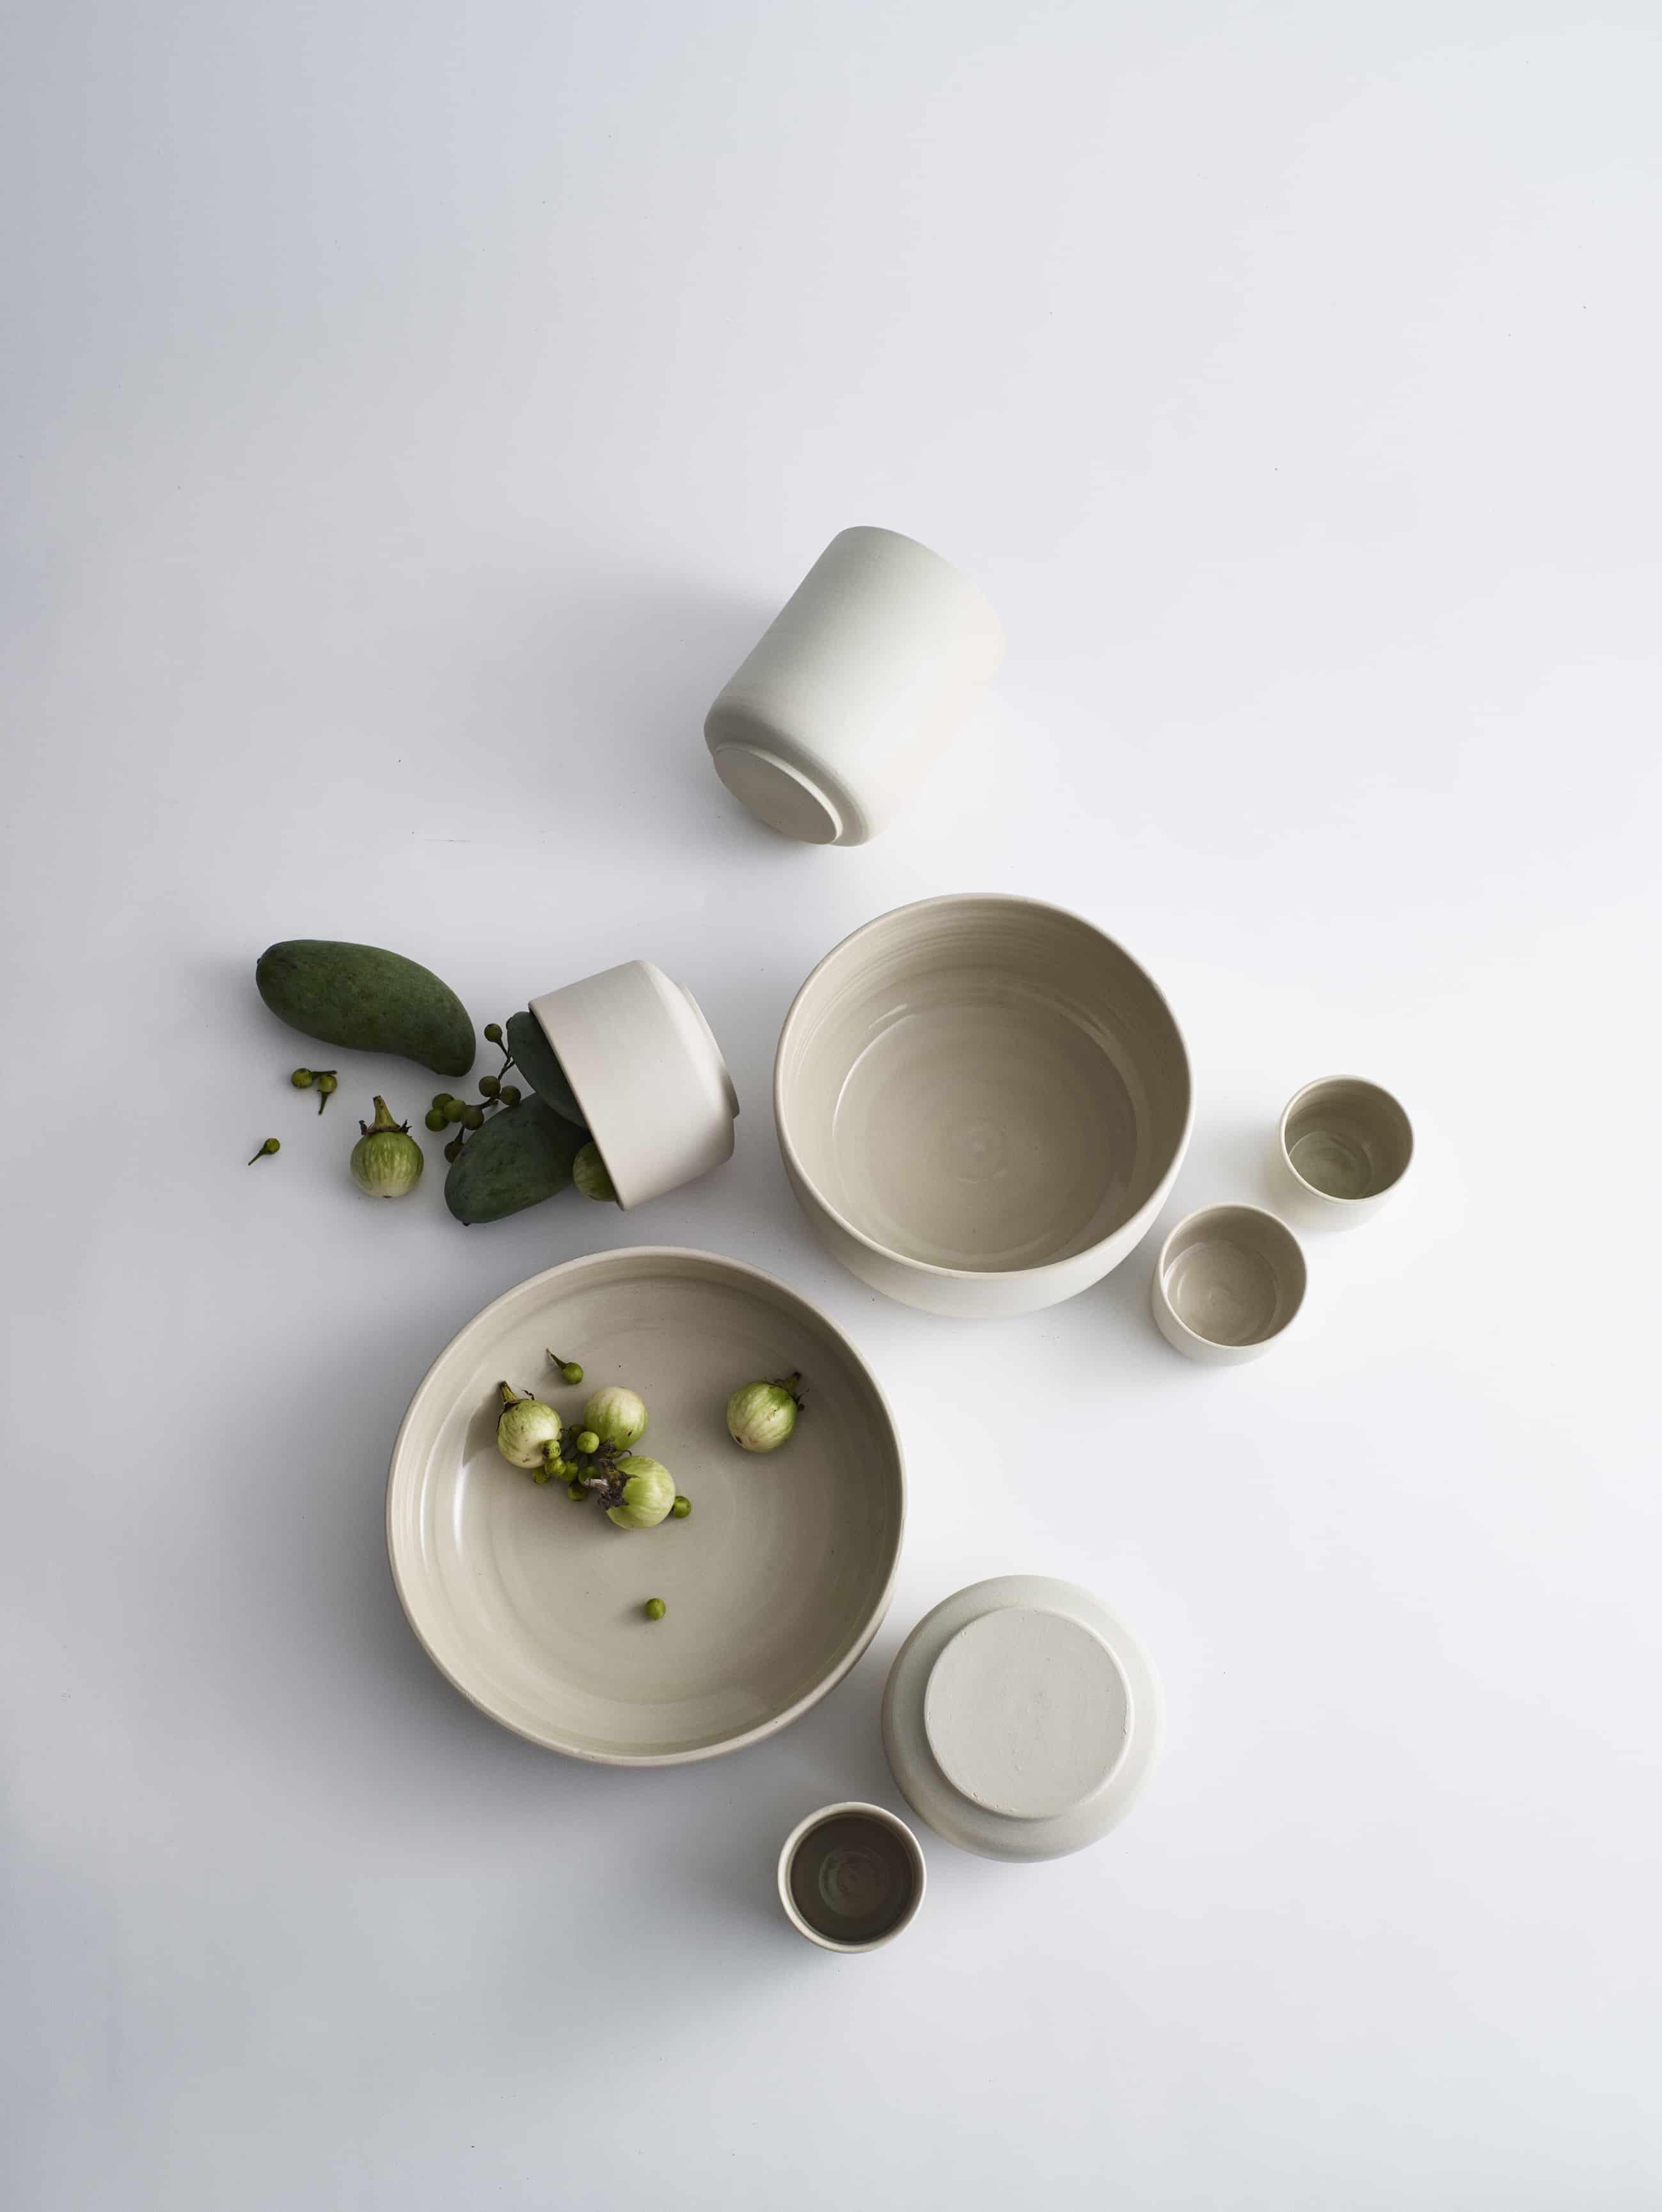 louise_roe_pisu_indai_keramika_japoniški_4_urban_soul